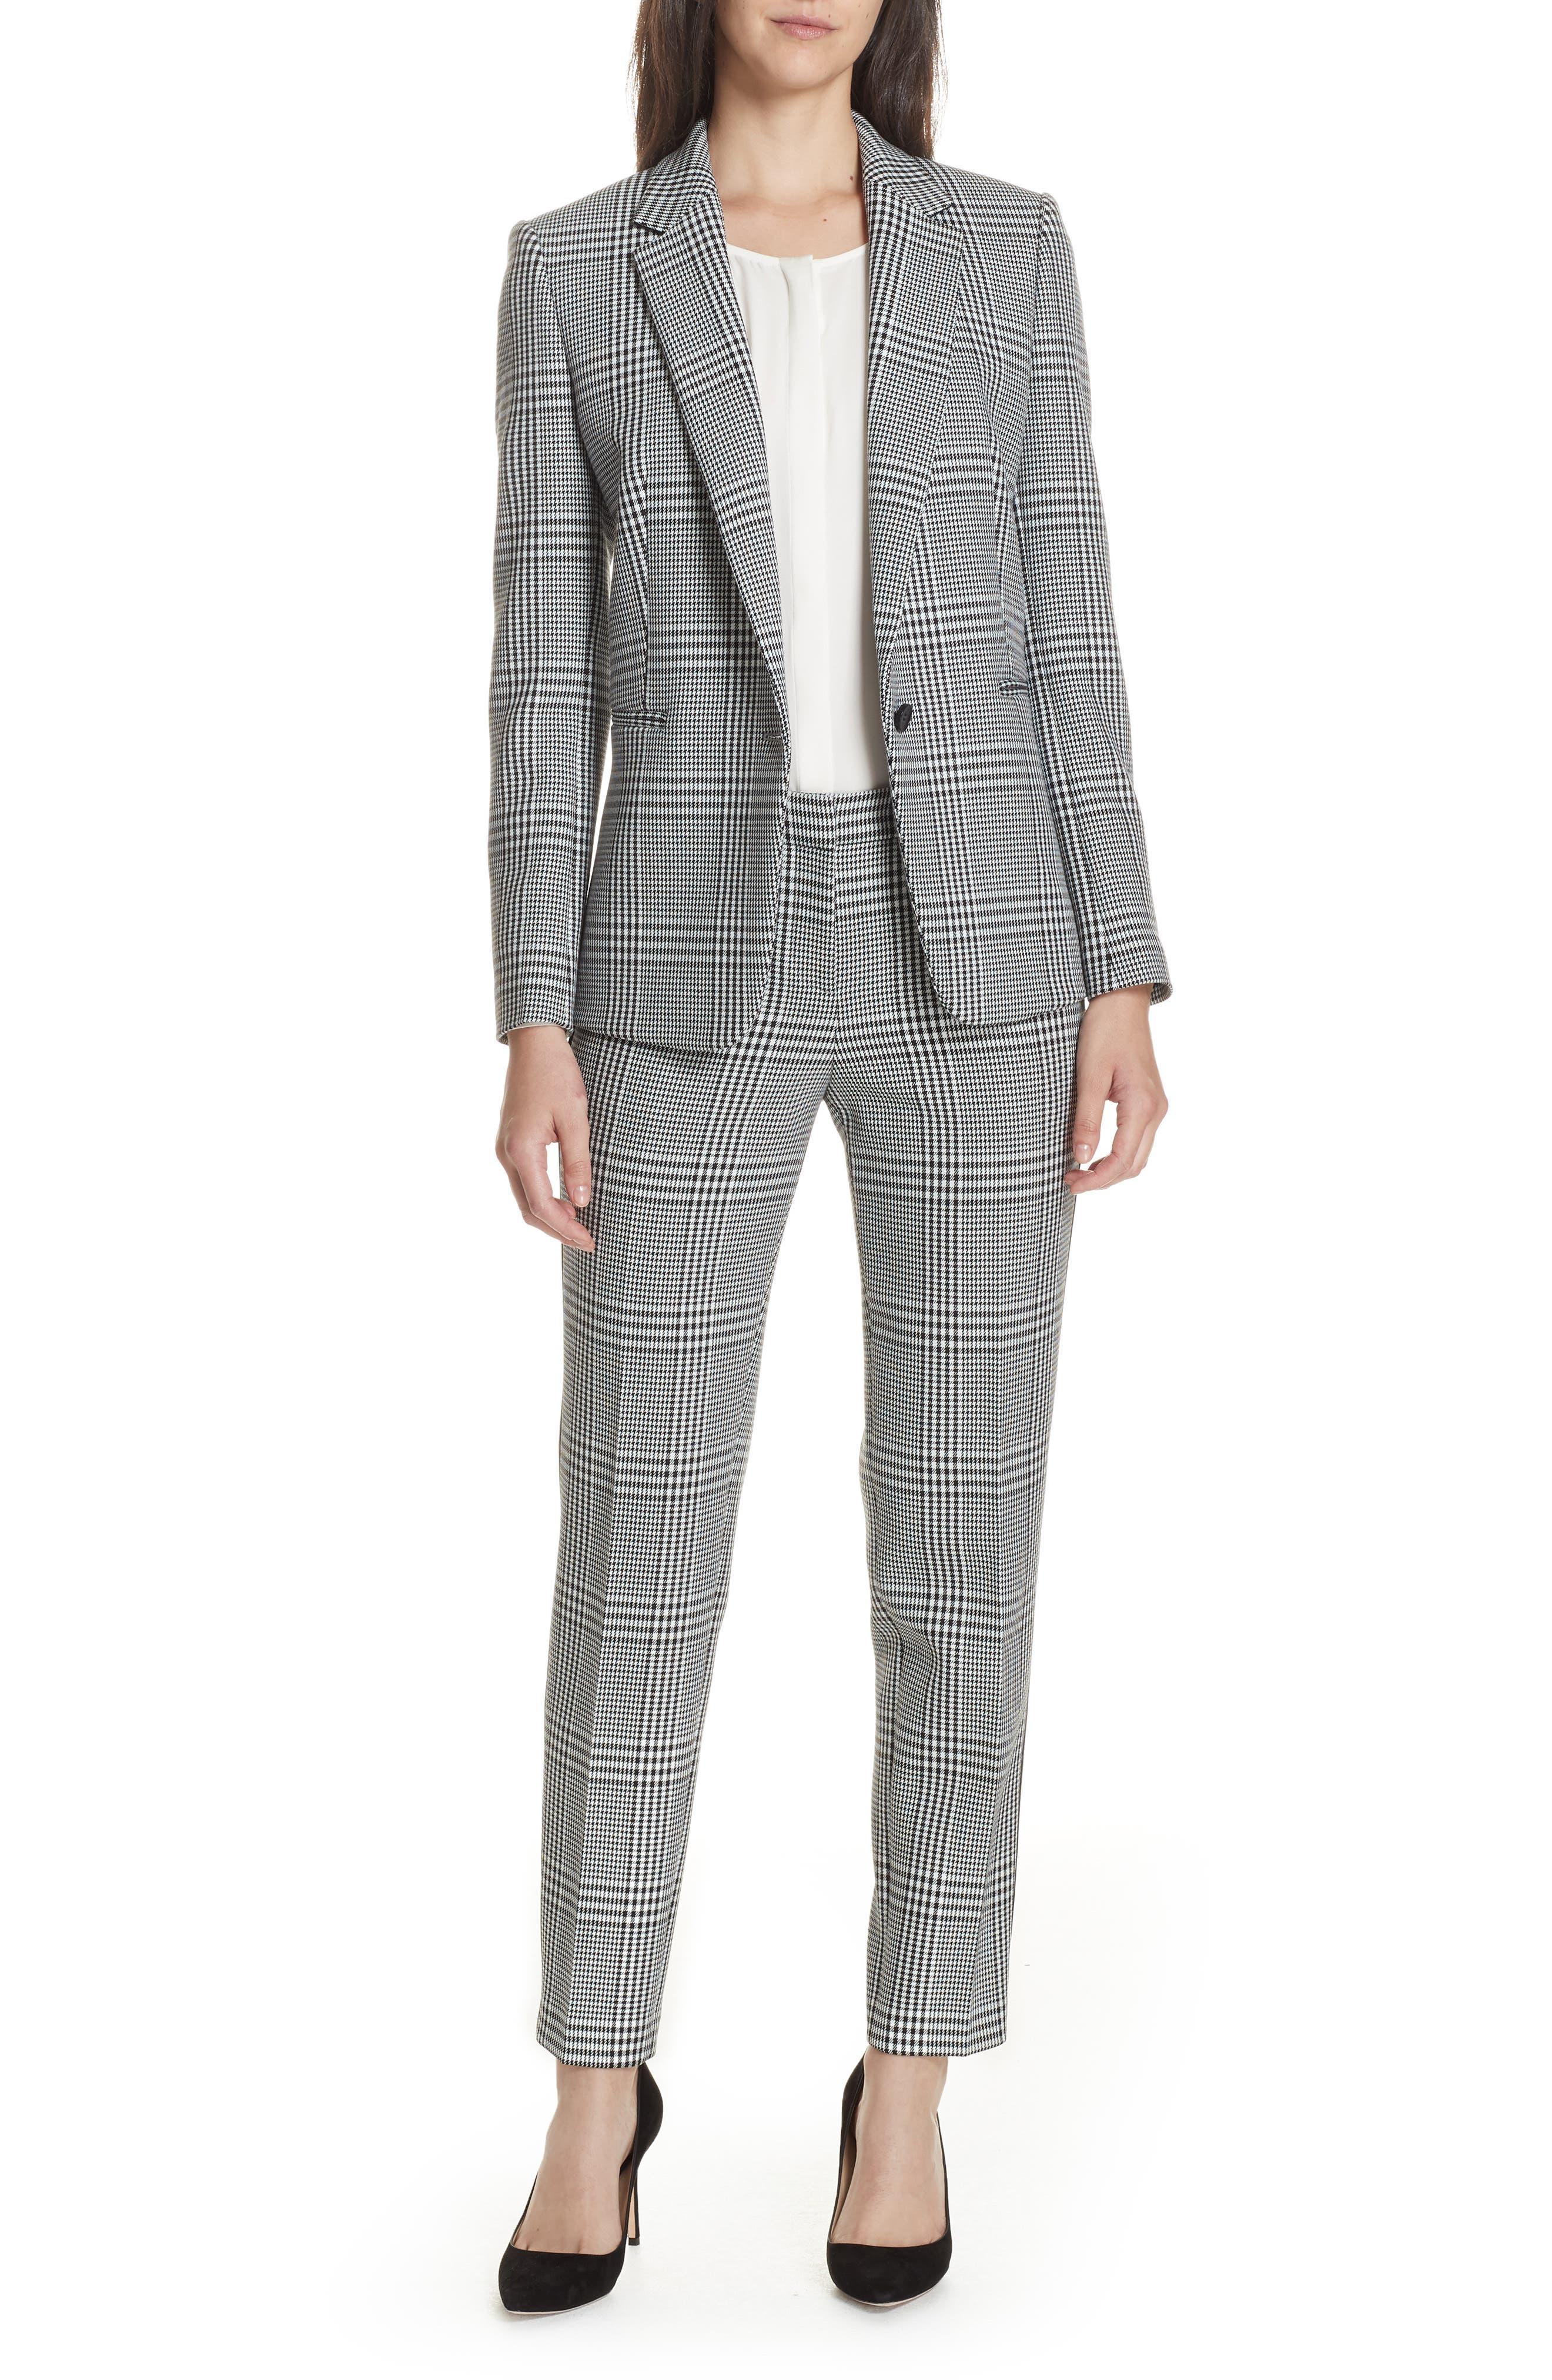 Jemaromina Glen Plaid Suit Jacket,                             Alternate thumbnail 7, color,                             020